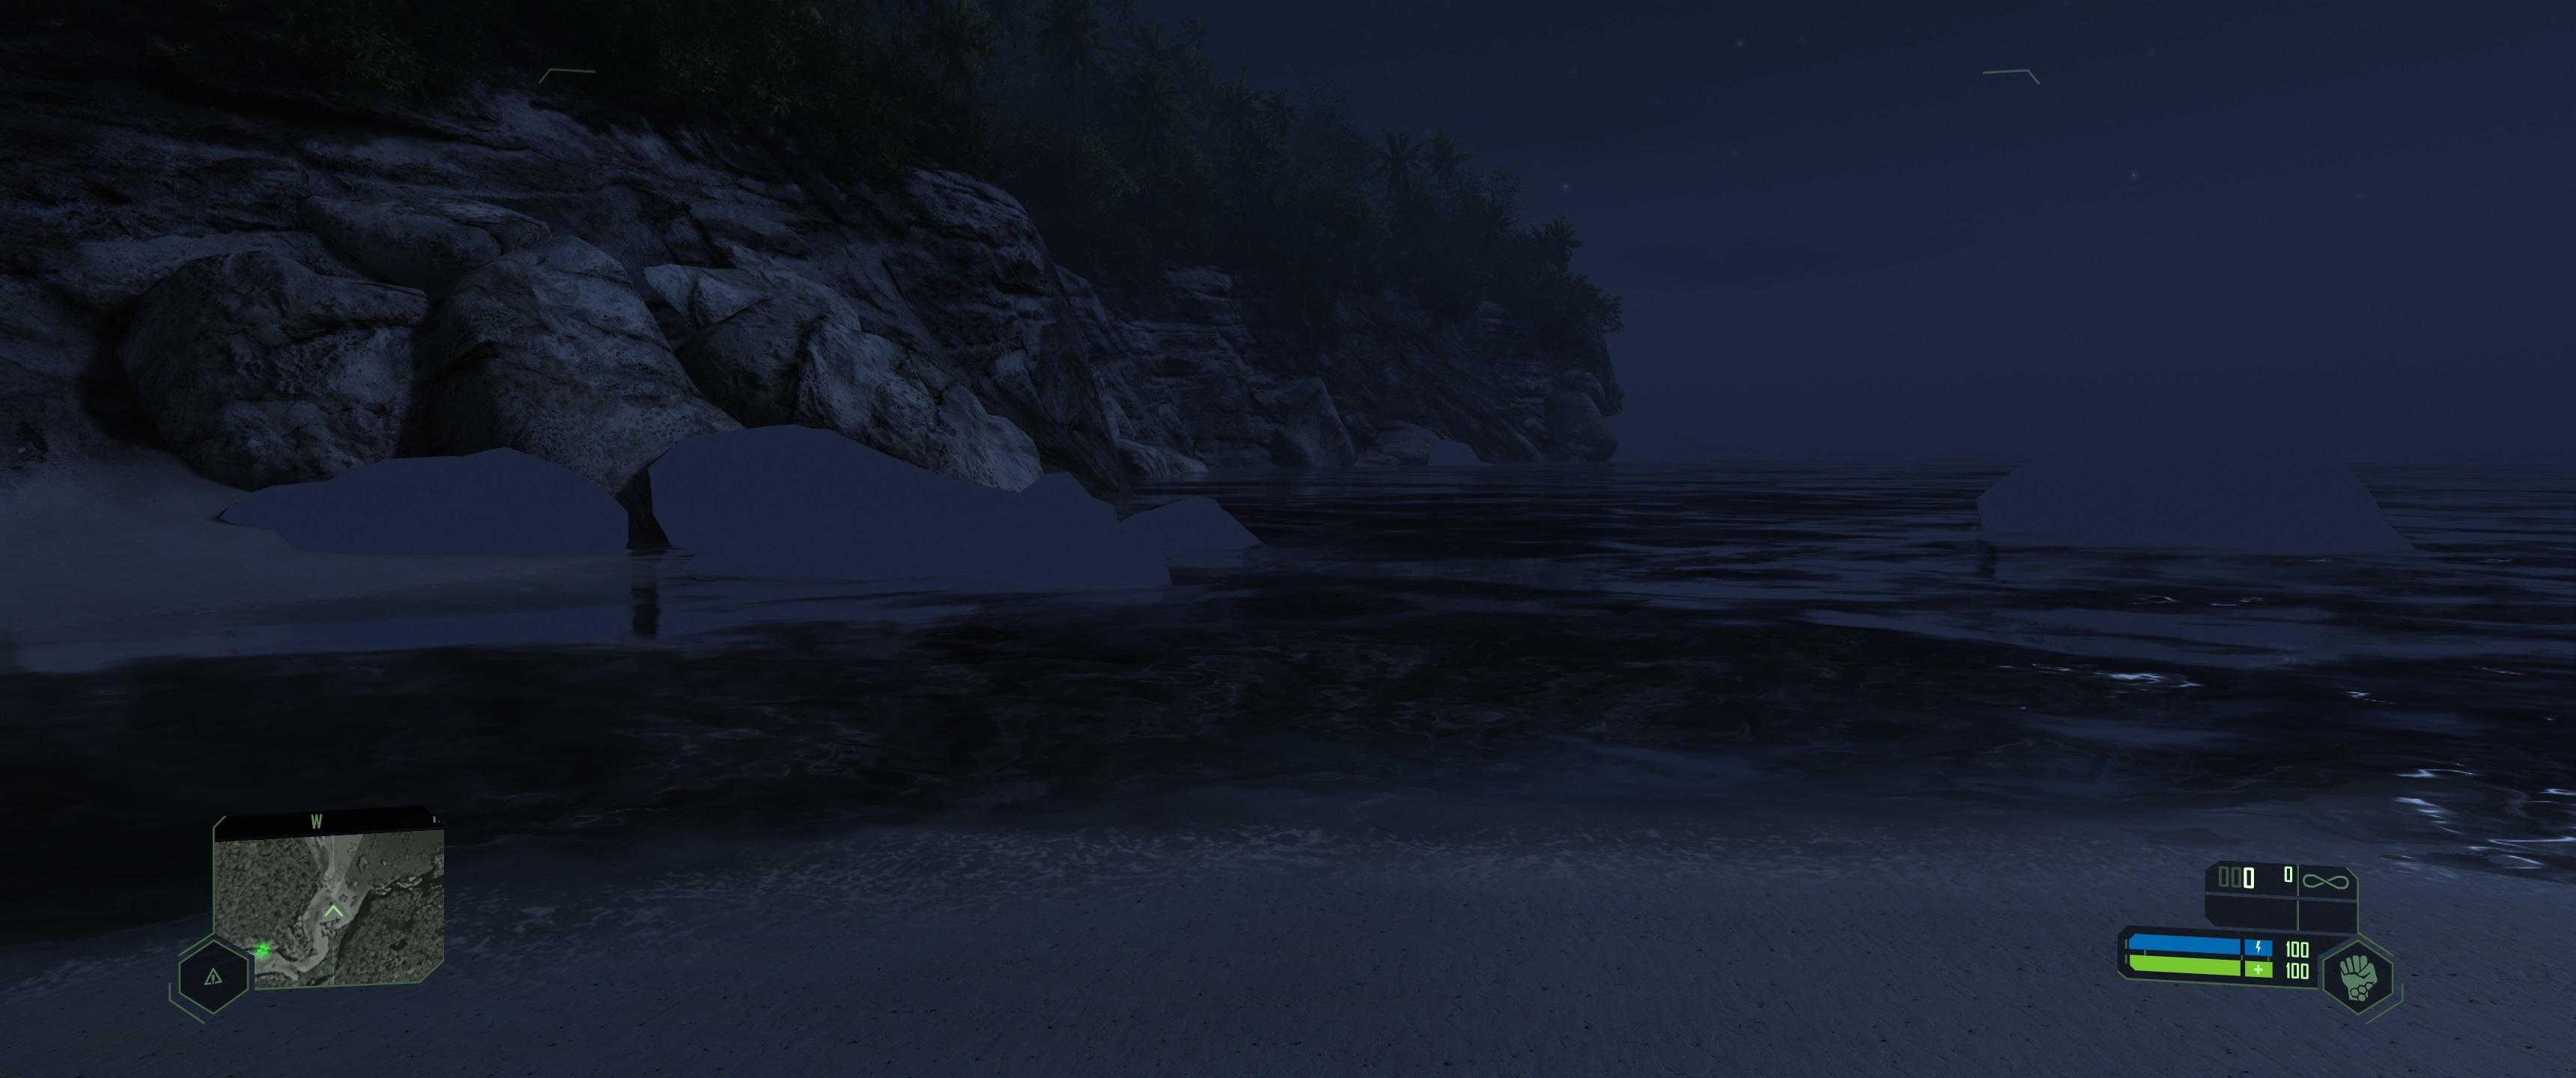 Crysis Remastered Screenshot 2021.03.13 - 15.26.39.51.jpg test3.jpg